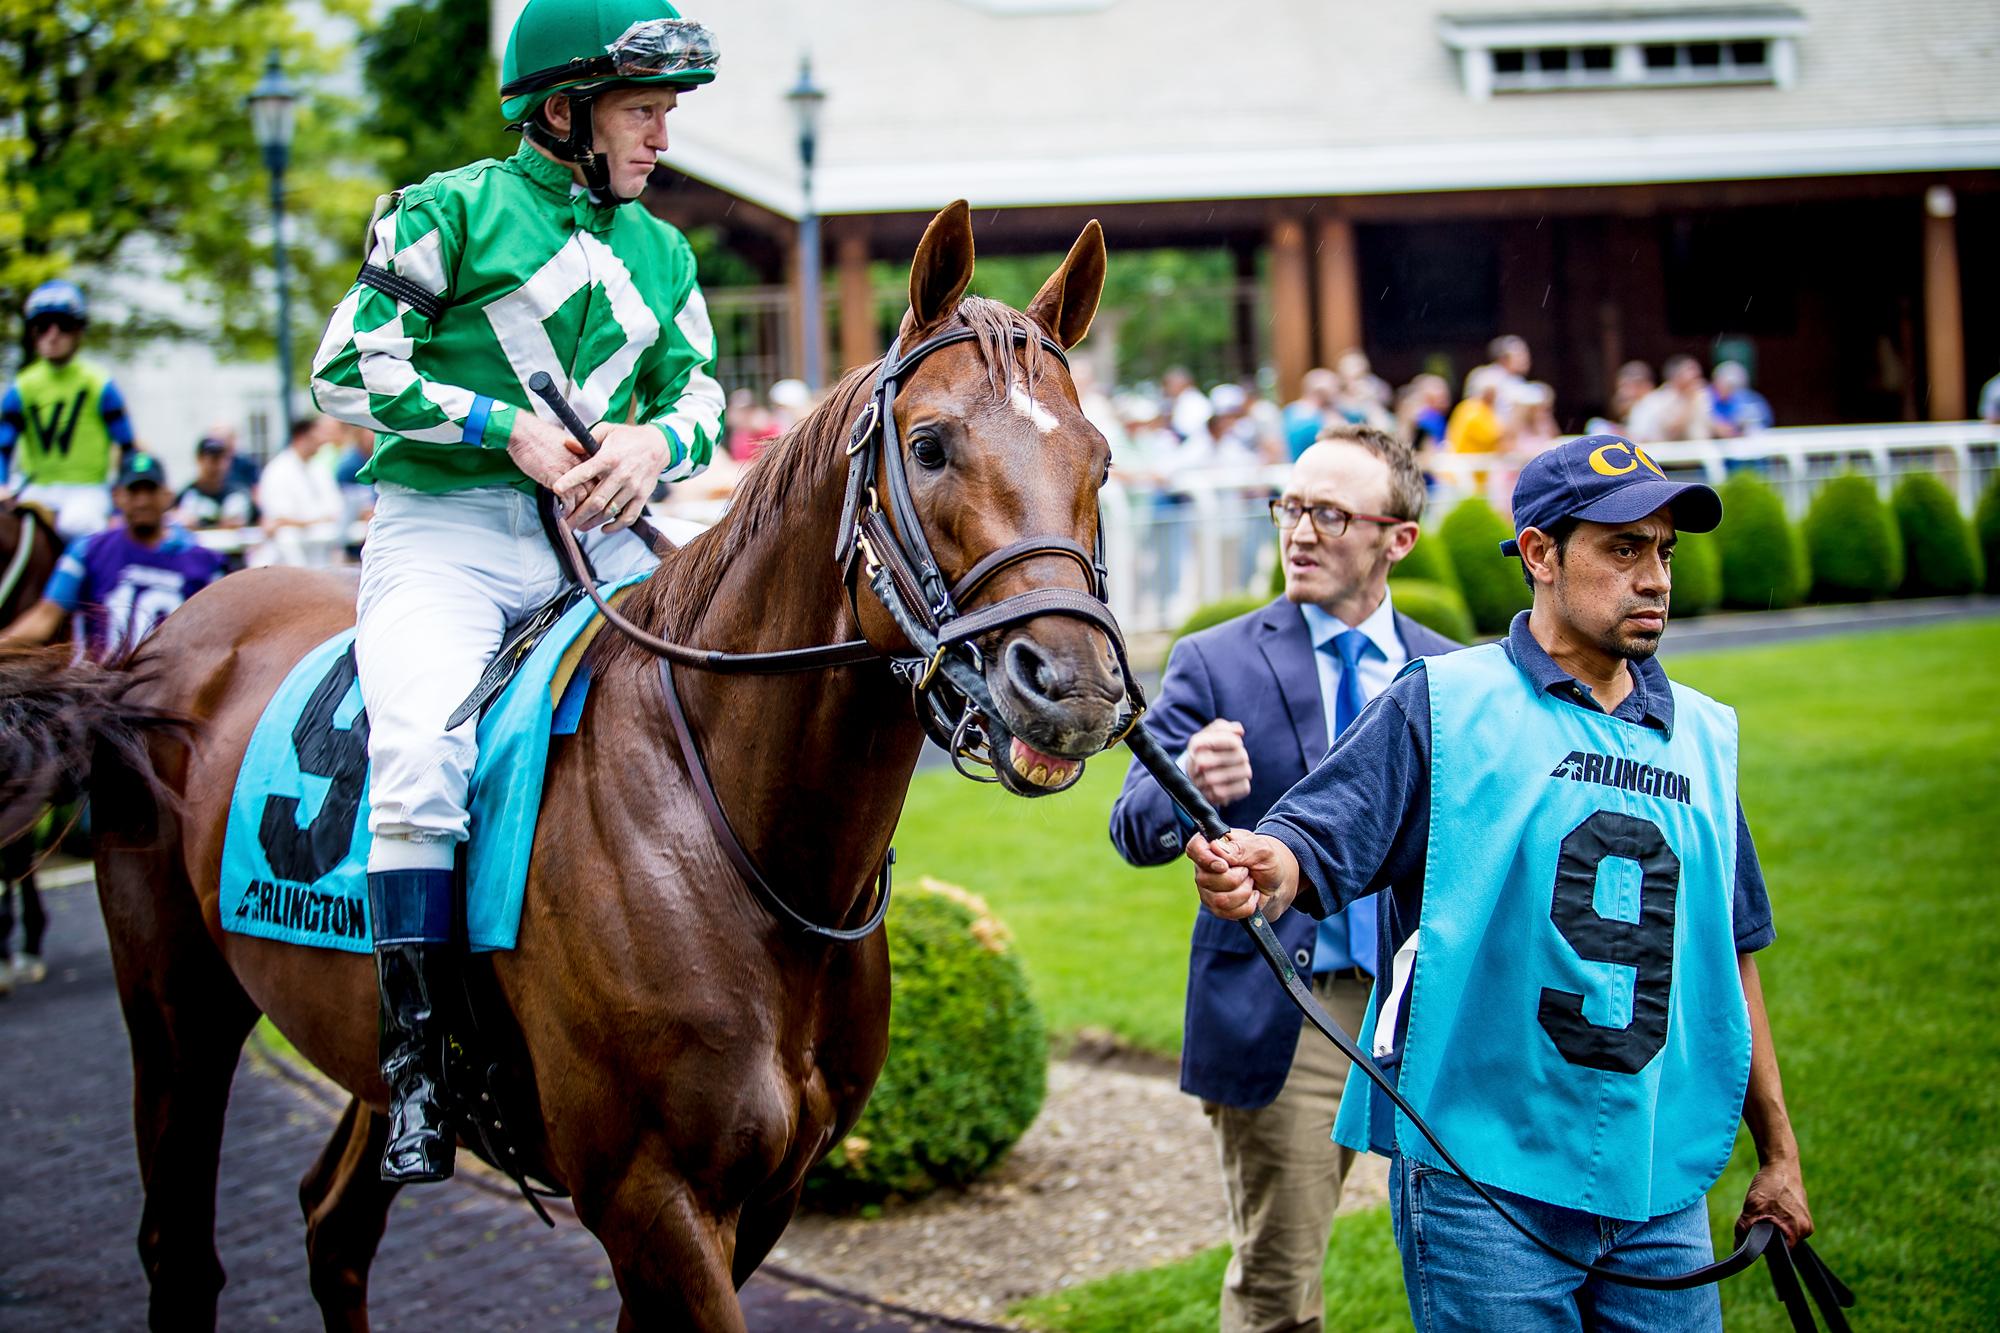 Race_Horses_401_2000x2000.jpg